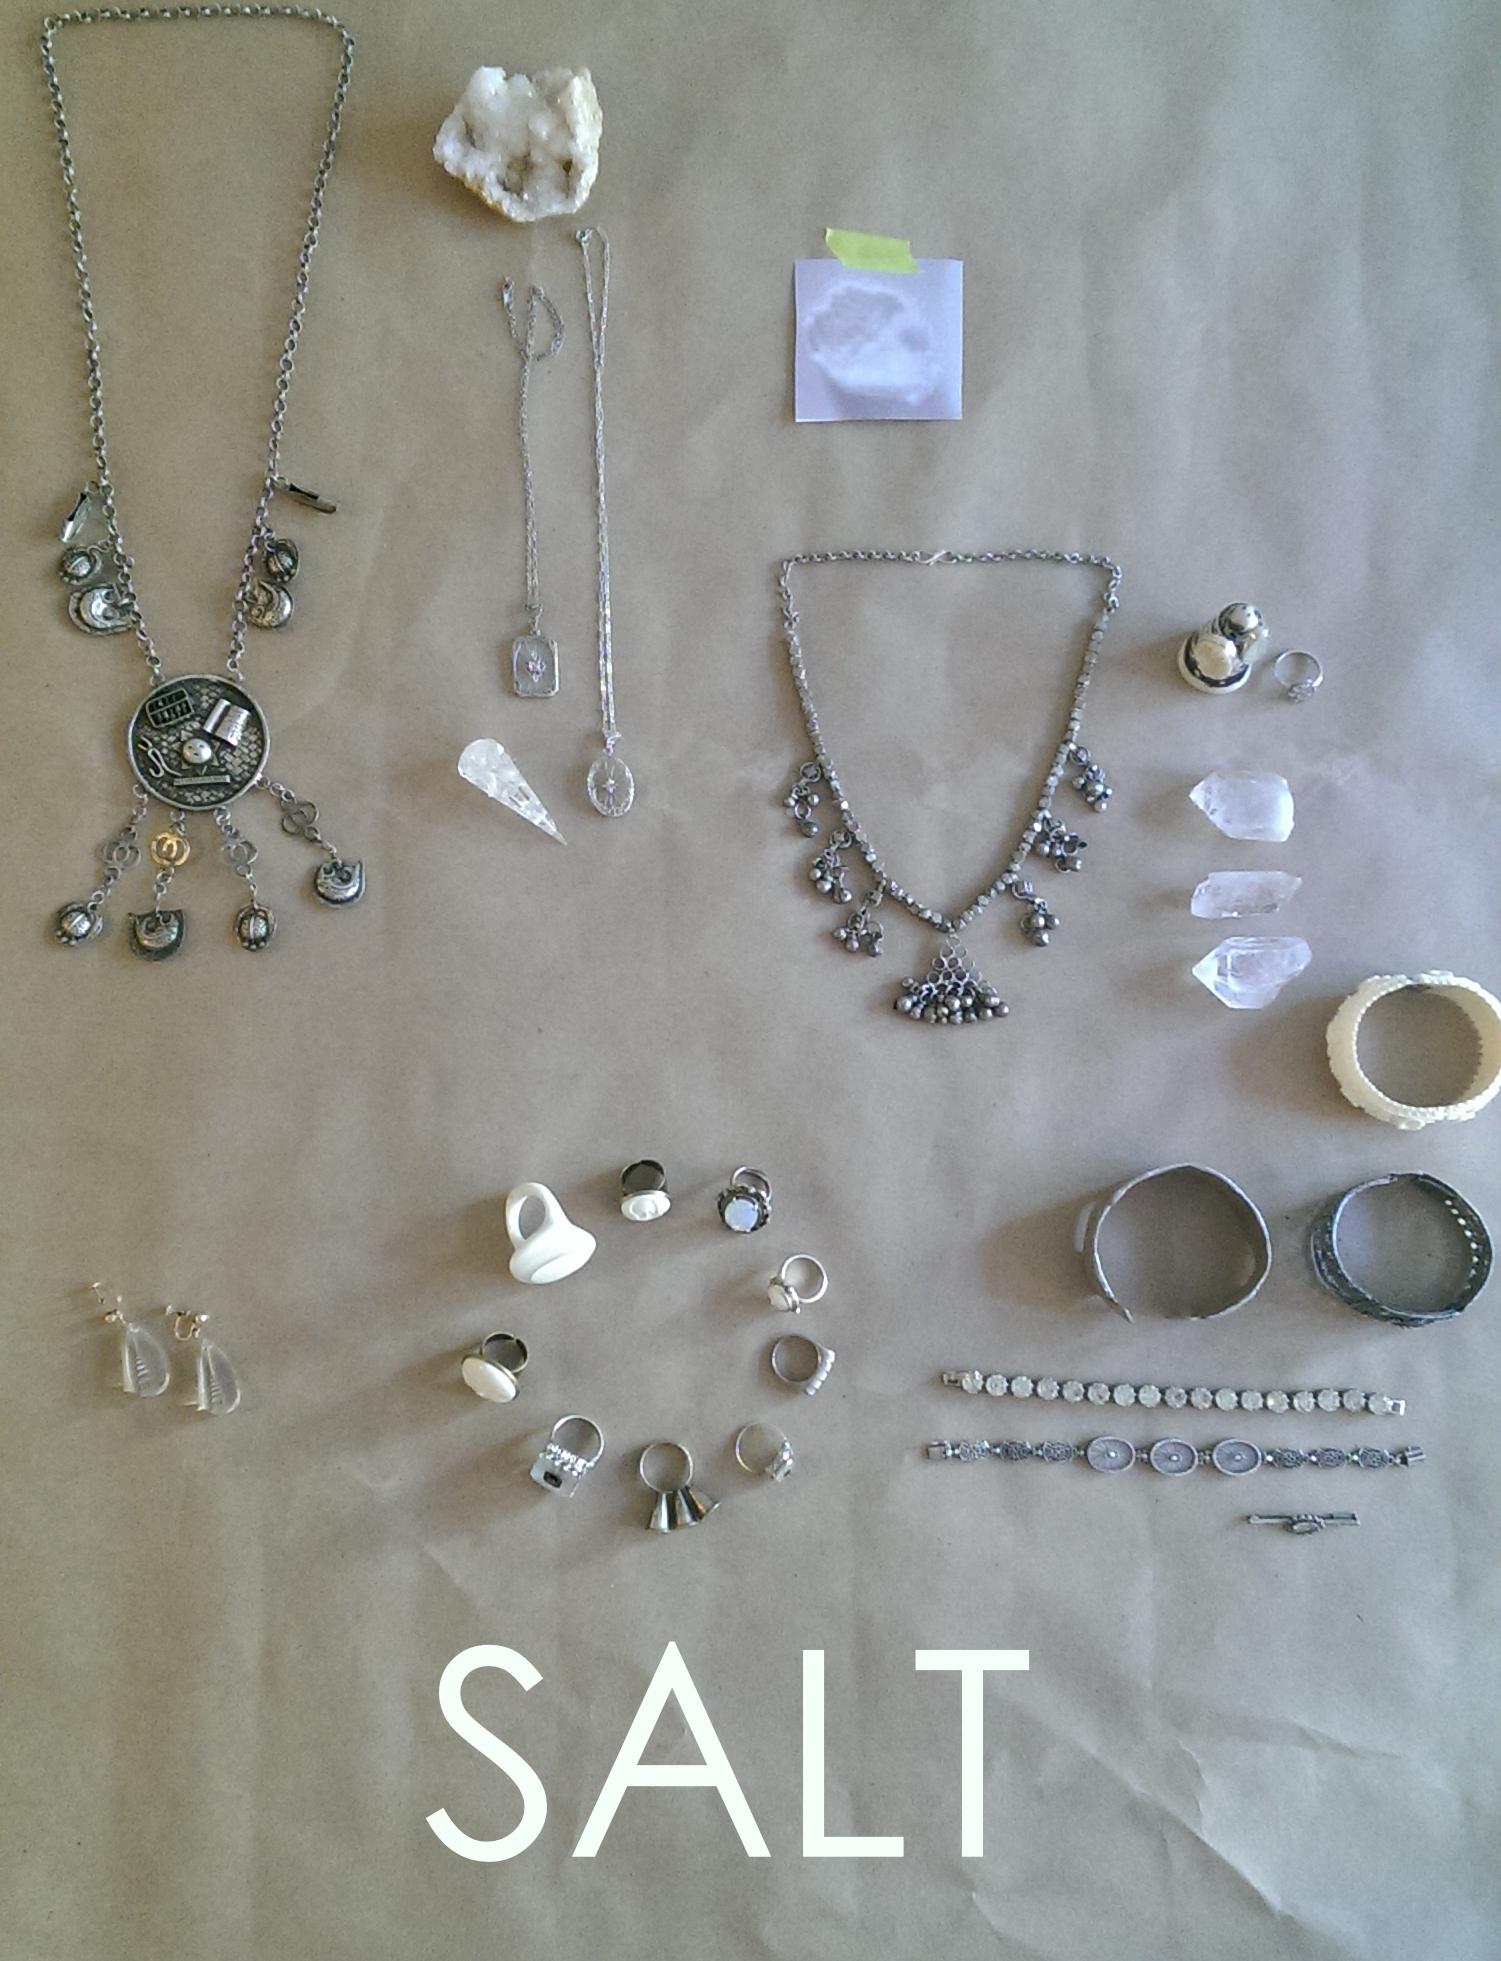 SALT group photo1.png